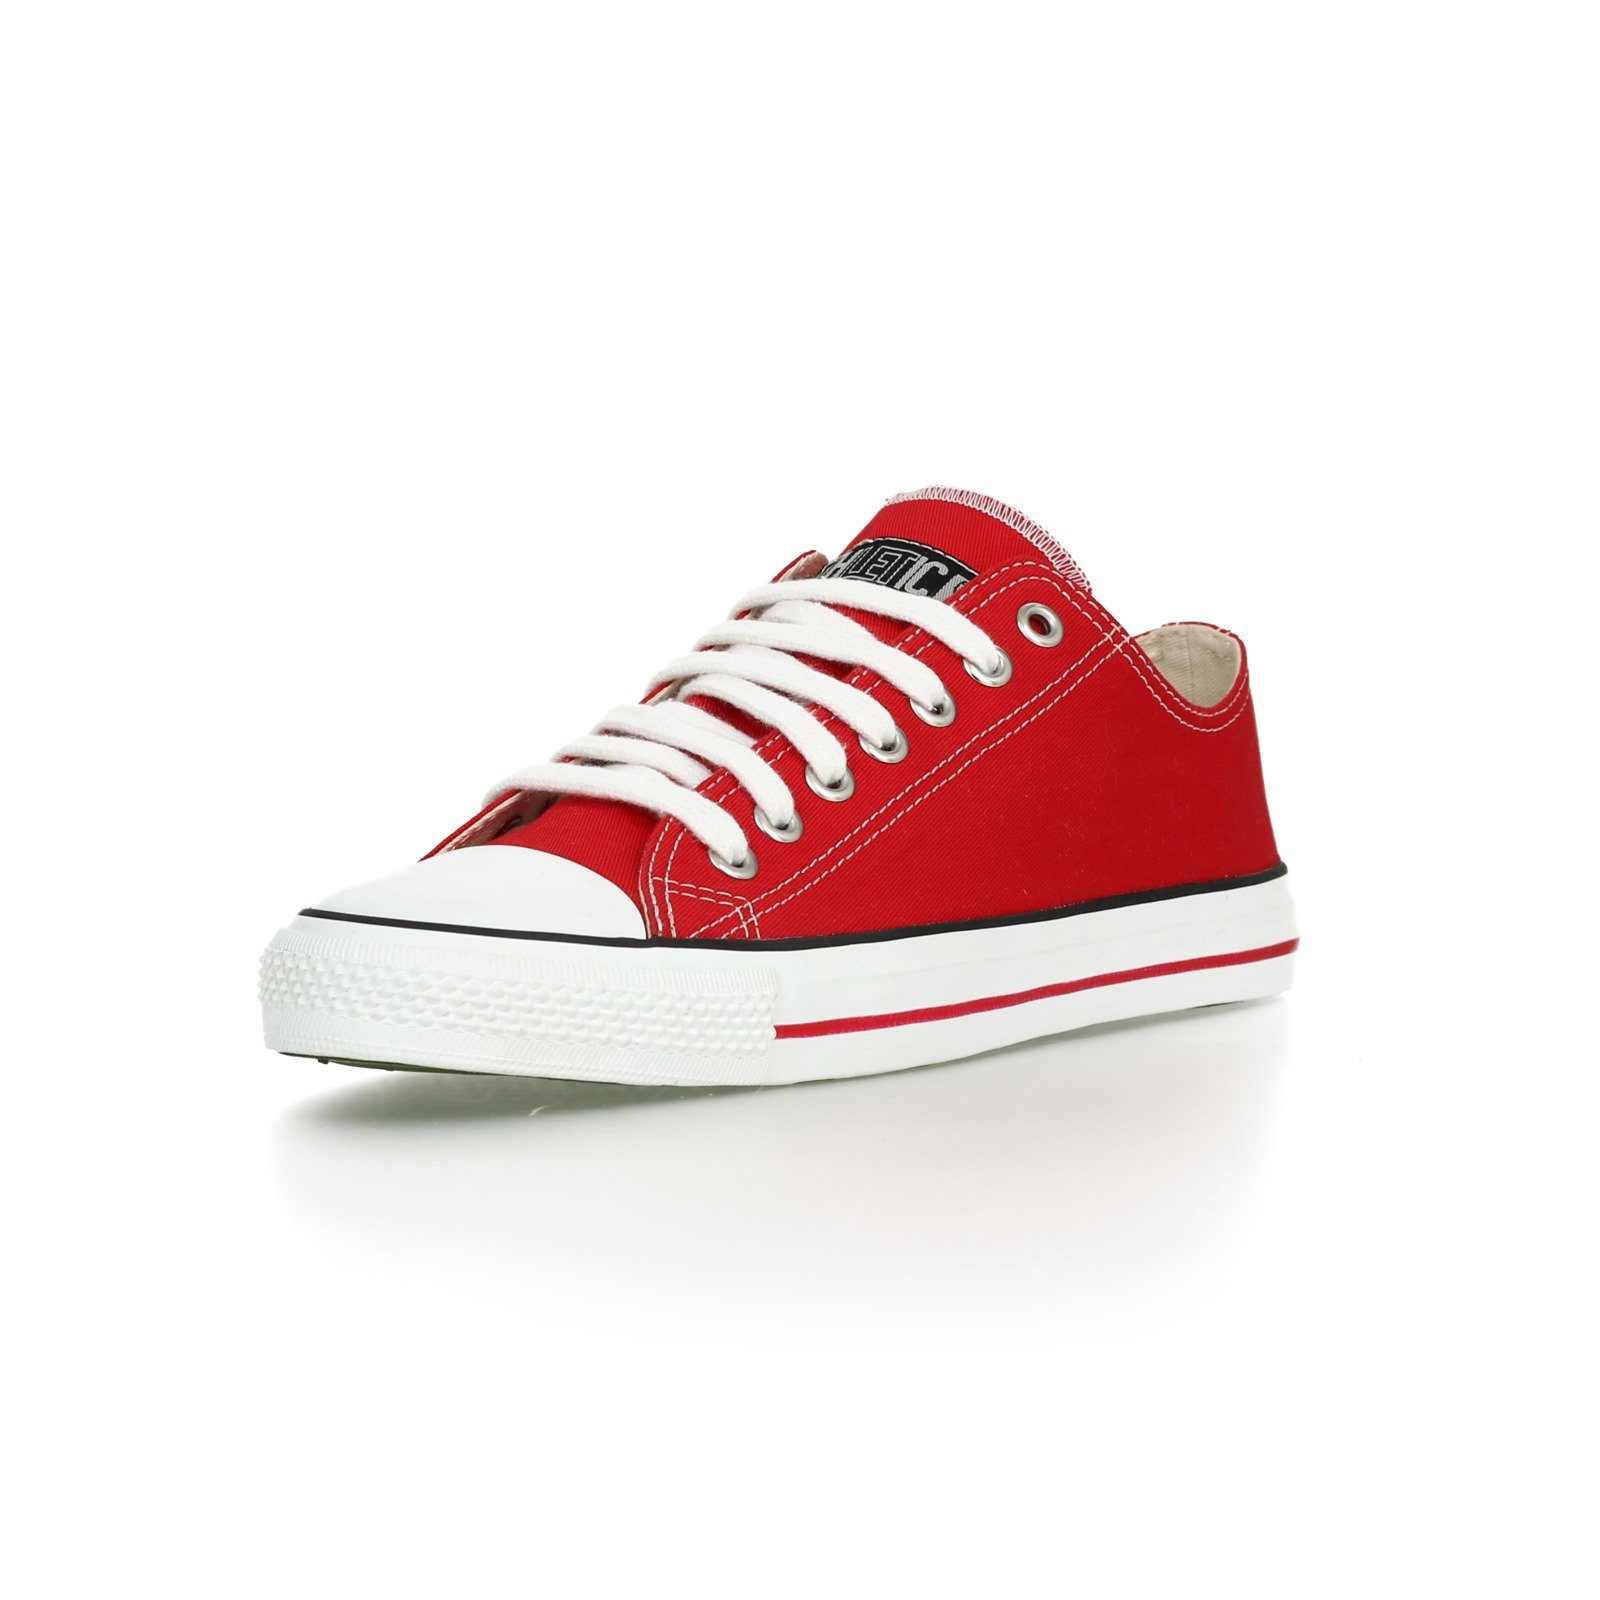 ETHLETIC Sneaker aus nachhaltiger Produktion White Cap Lo Cut Classic online kaufen  Cranberry Red | Just Whit